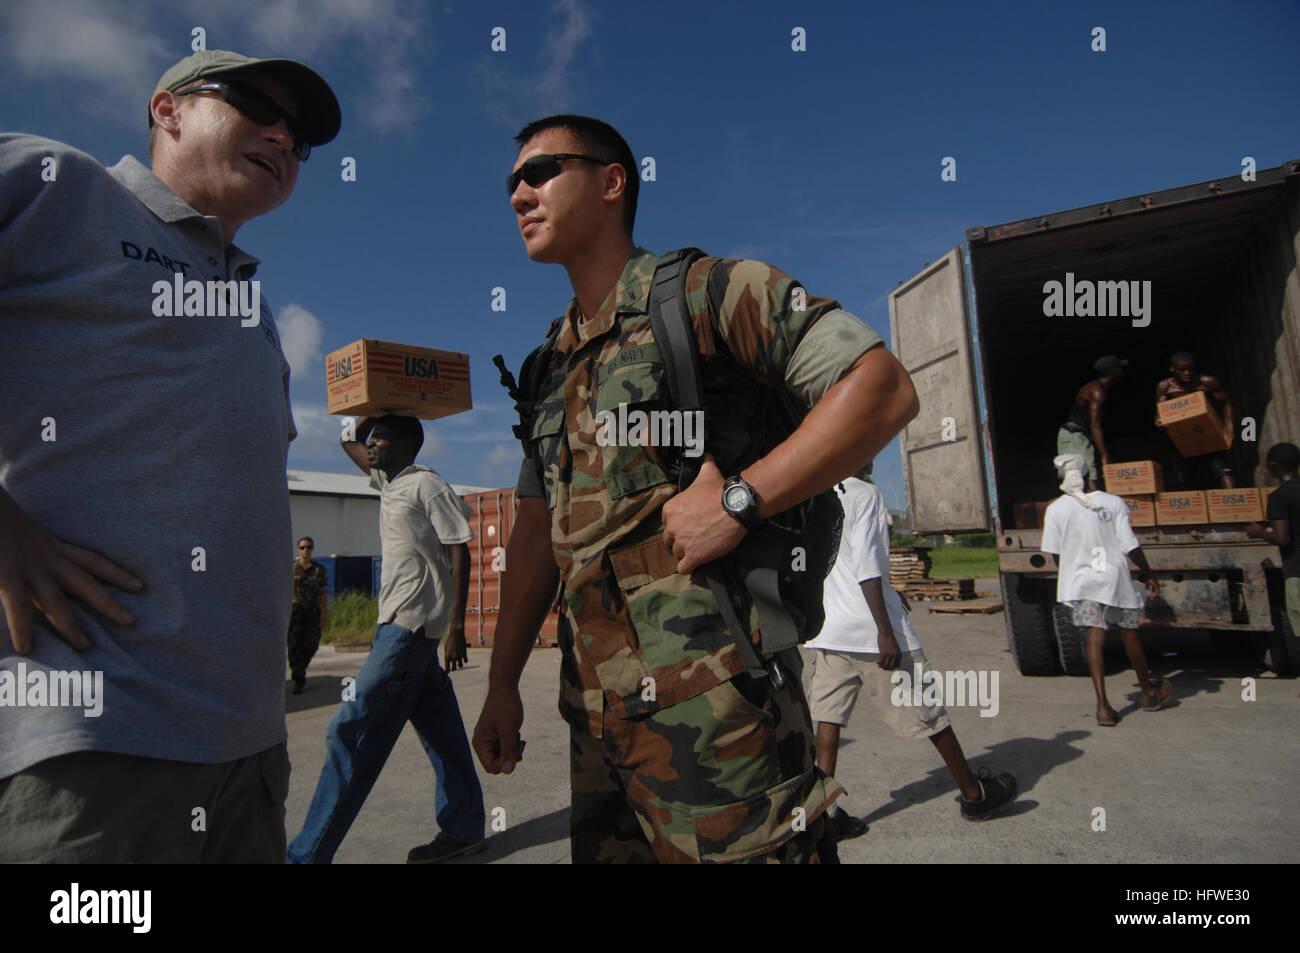 080916-N-2653P-184  PORT-AU-PRINCE, Haiti (Sept 16, 2008) Lt.j.g. Albert Gembara, Officer-in-Charge of Maritime Stock Photo